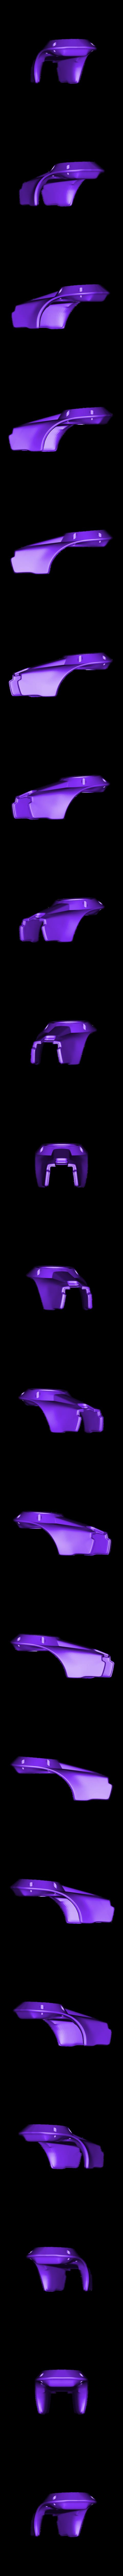 Lucio_lid.stl Download free STL file Overwatch Lucio Blaster • 3D printer object, Adafruit